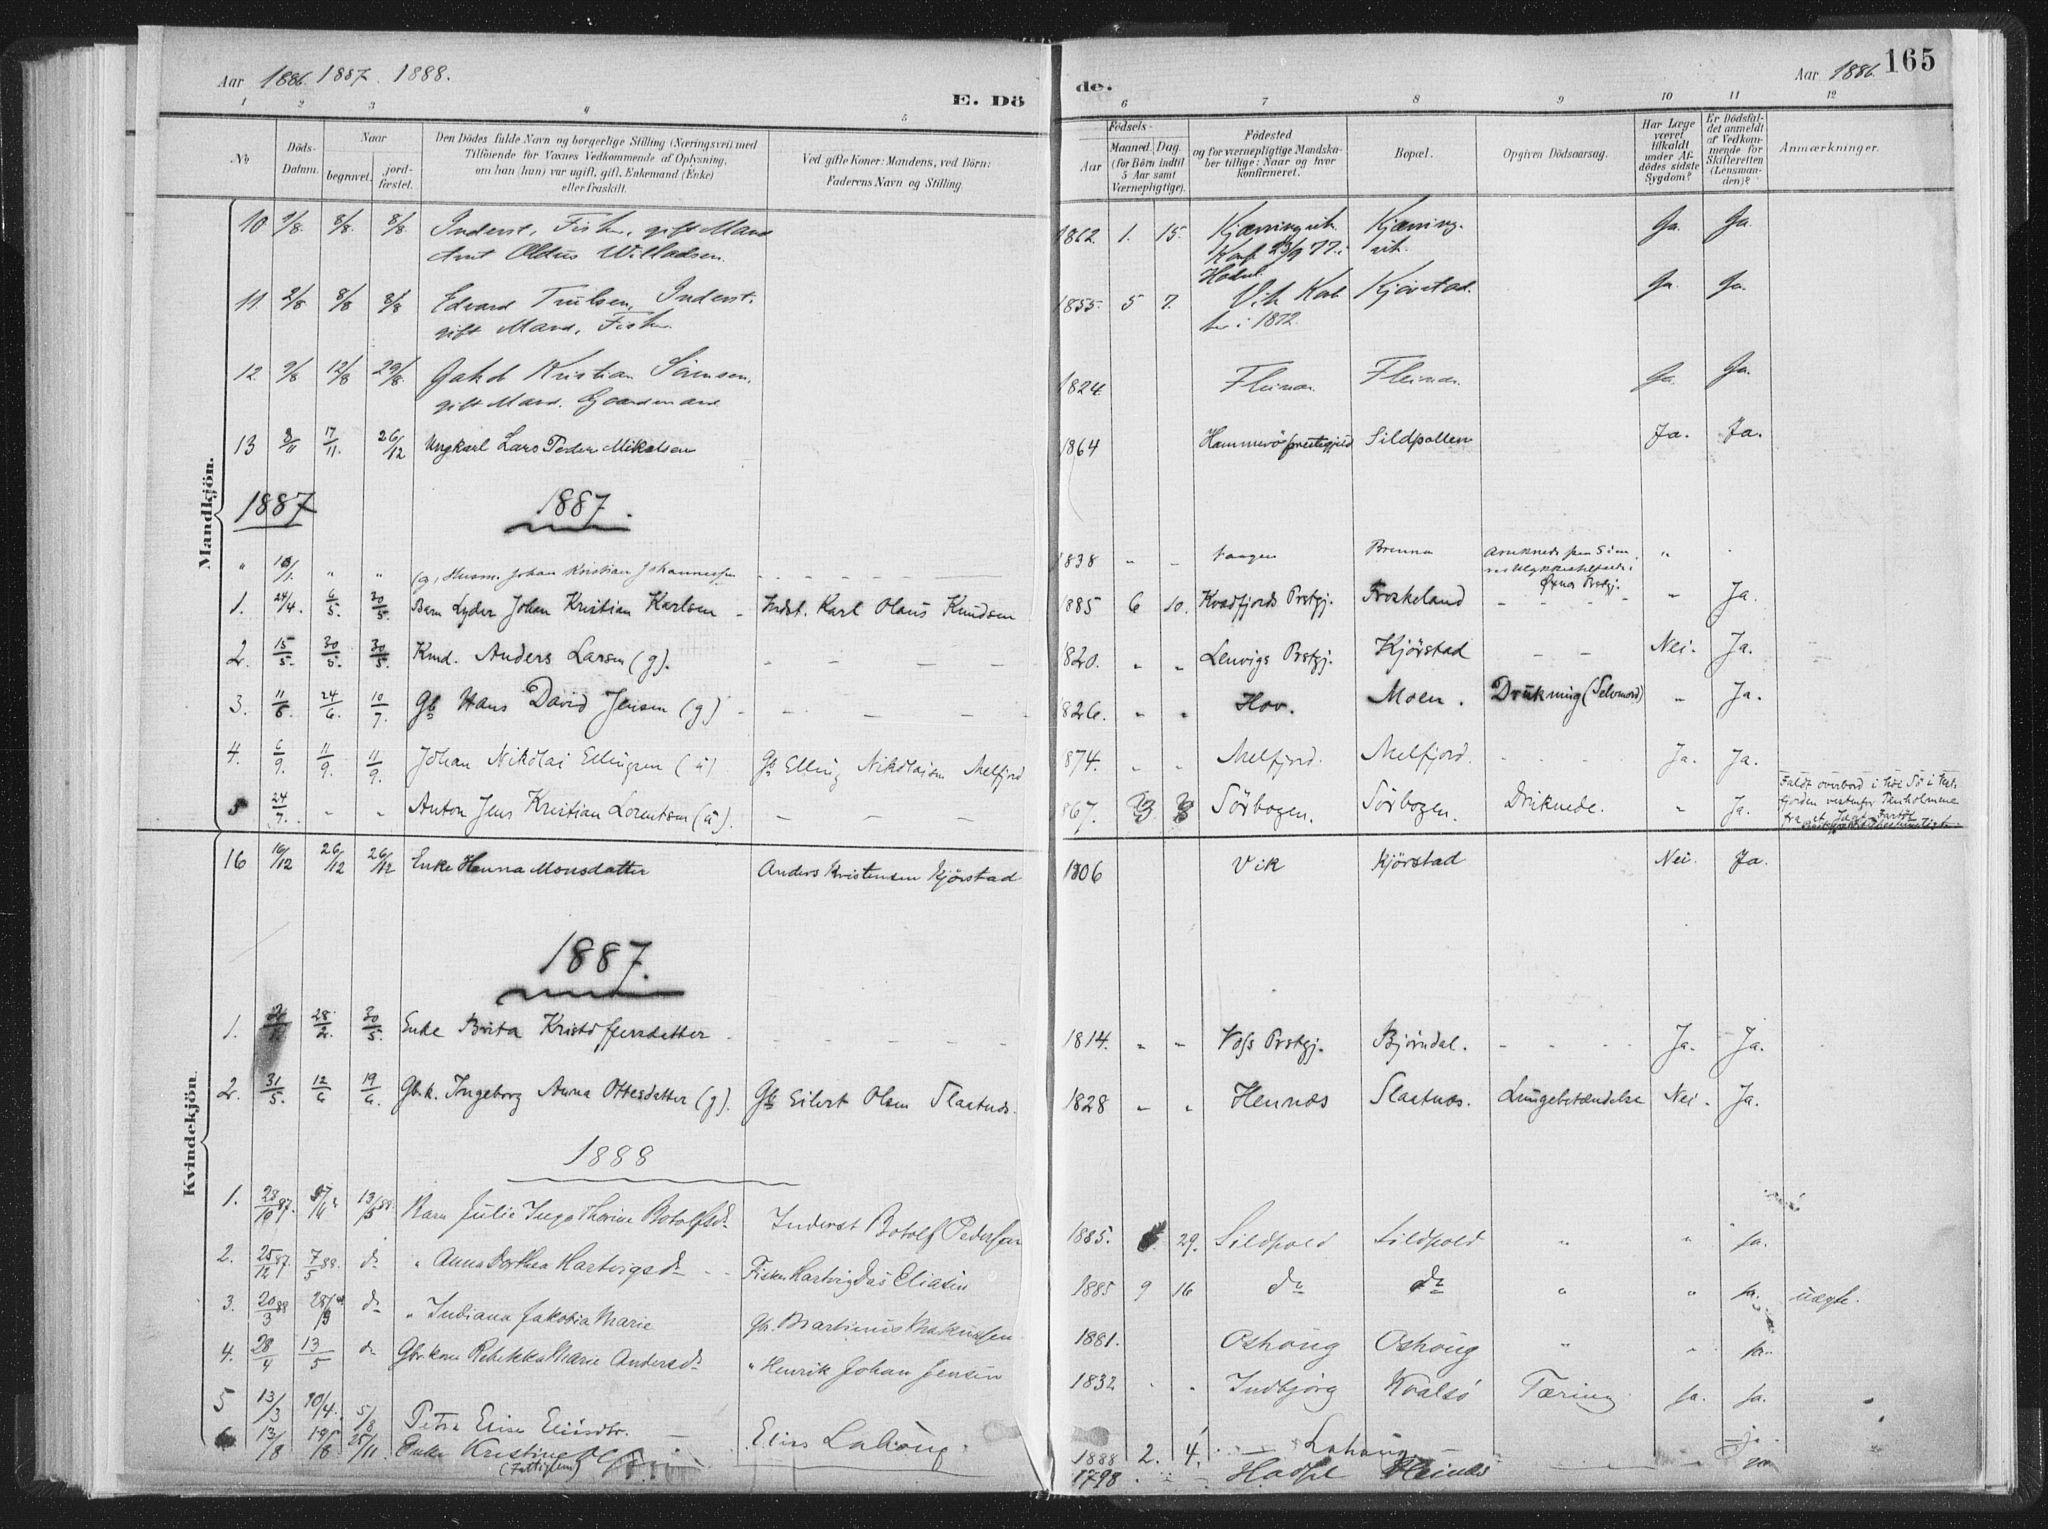 SAT, Ministerialprotokoller, klokkerbøker og fødselsregistre - Nordland, 890/L1286: Ministerialbok nr. 890A01, 1882-1902, s. 165